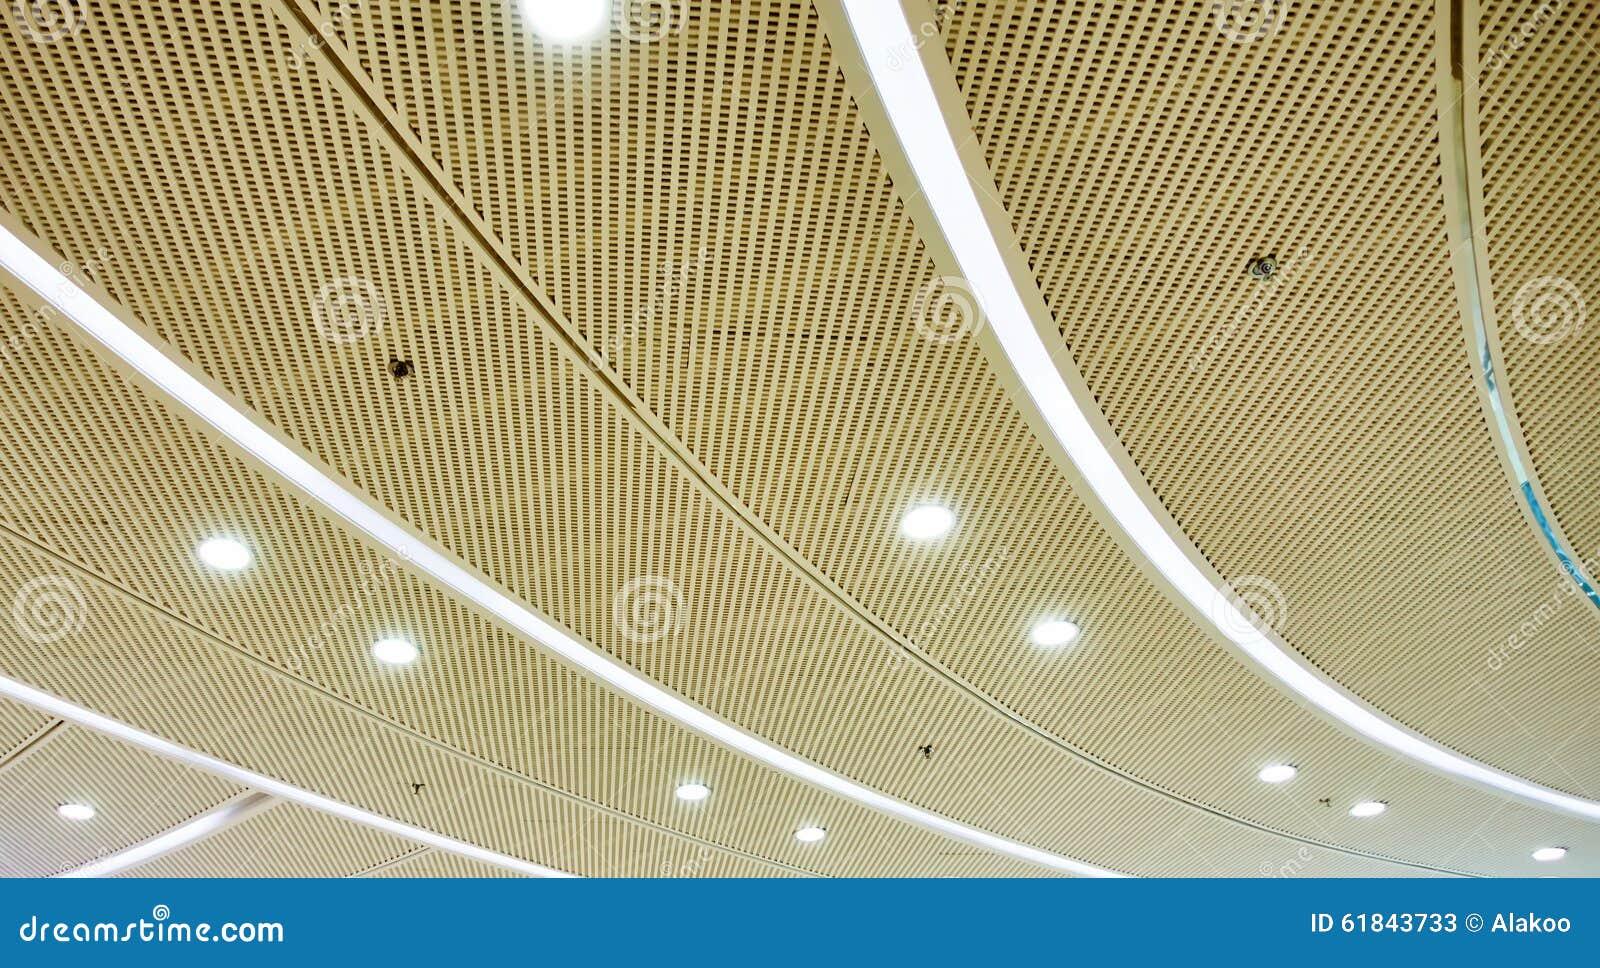 Led deckenbeleuchtung stockfoto   bild: 61843733